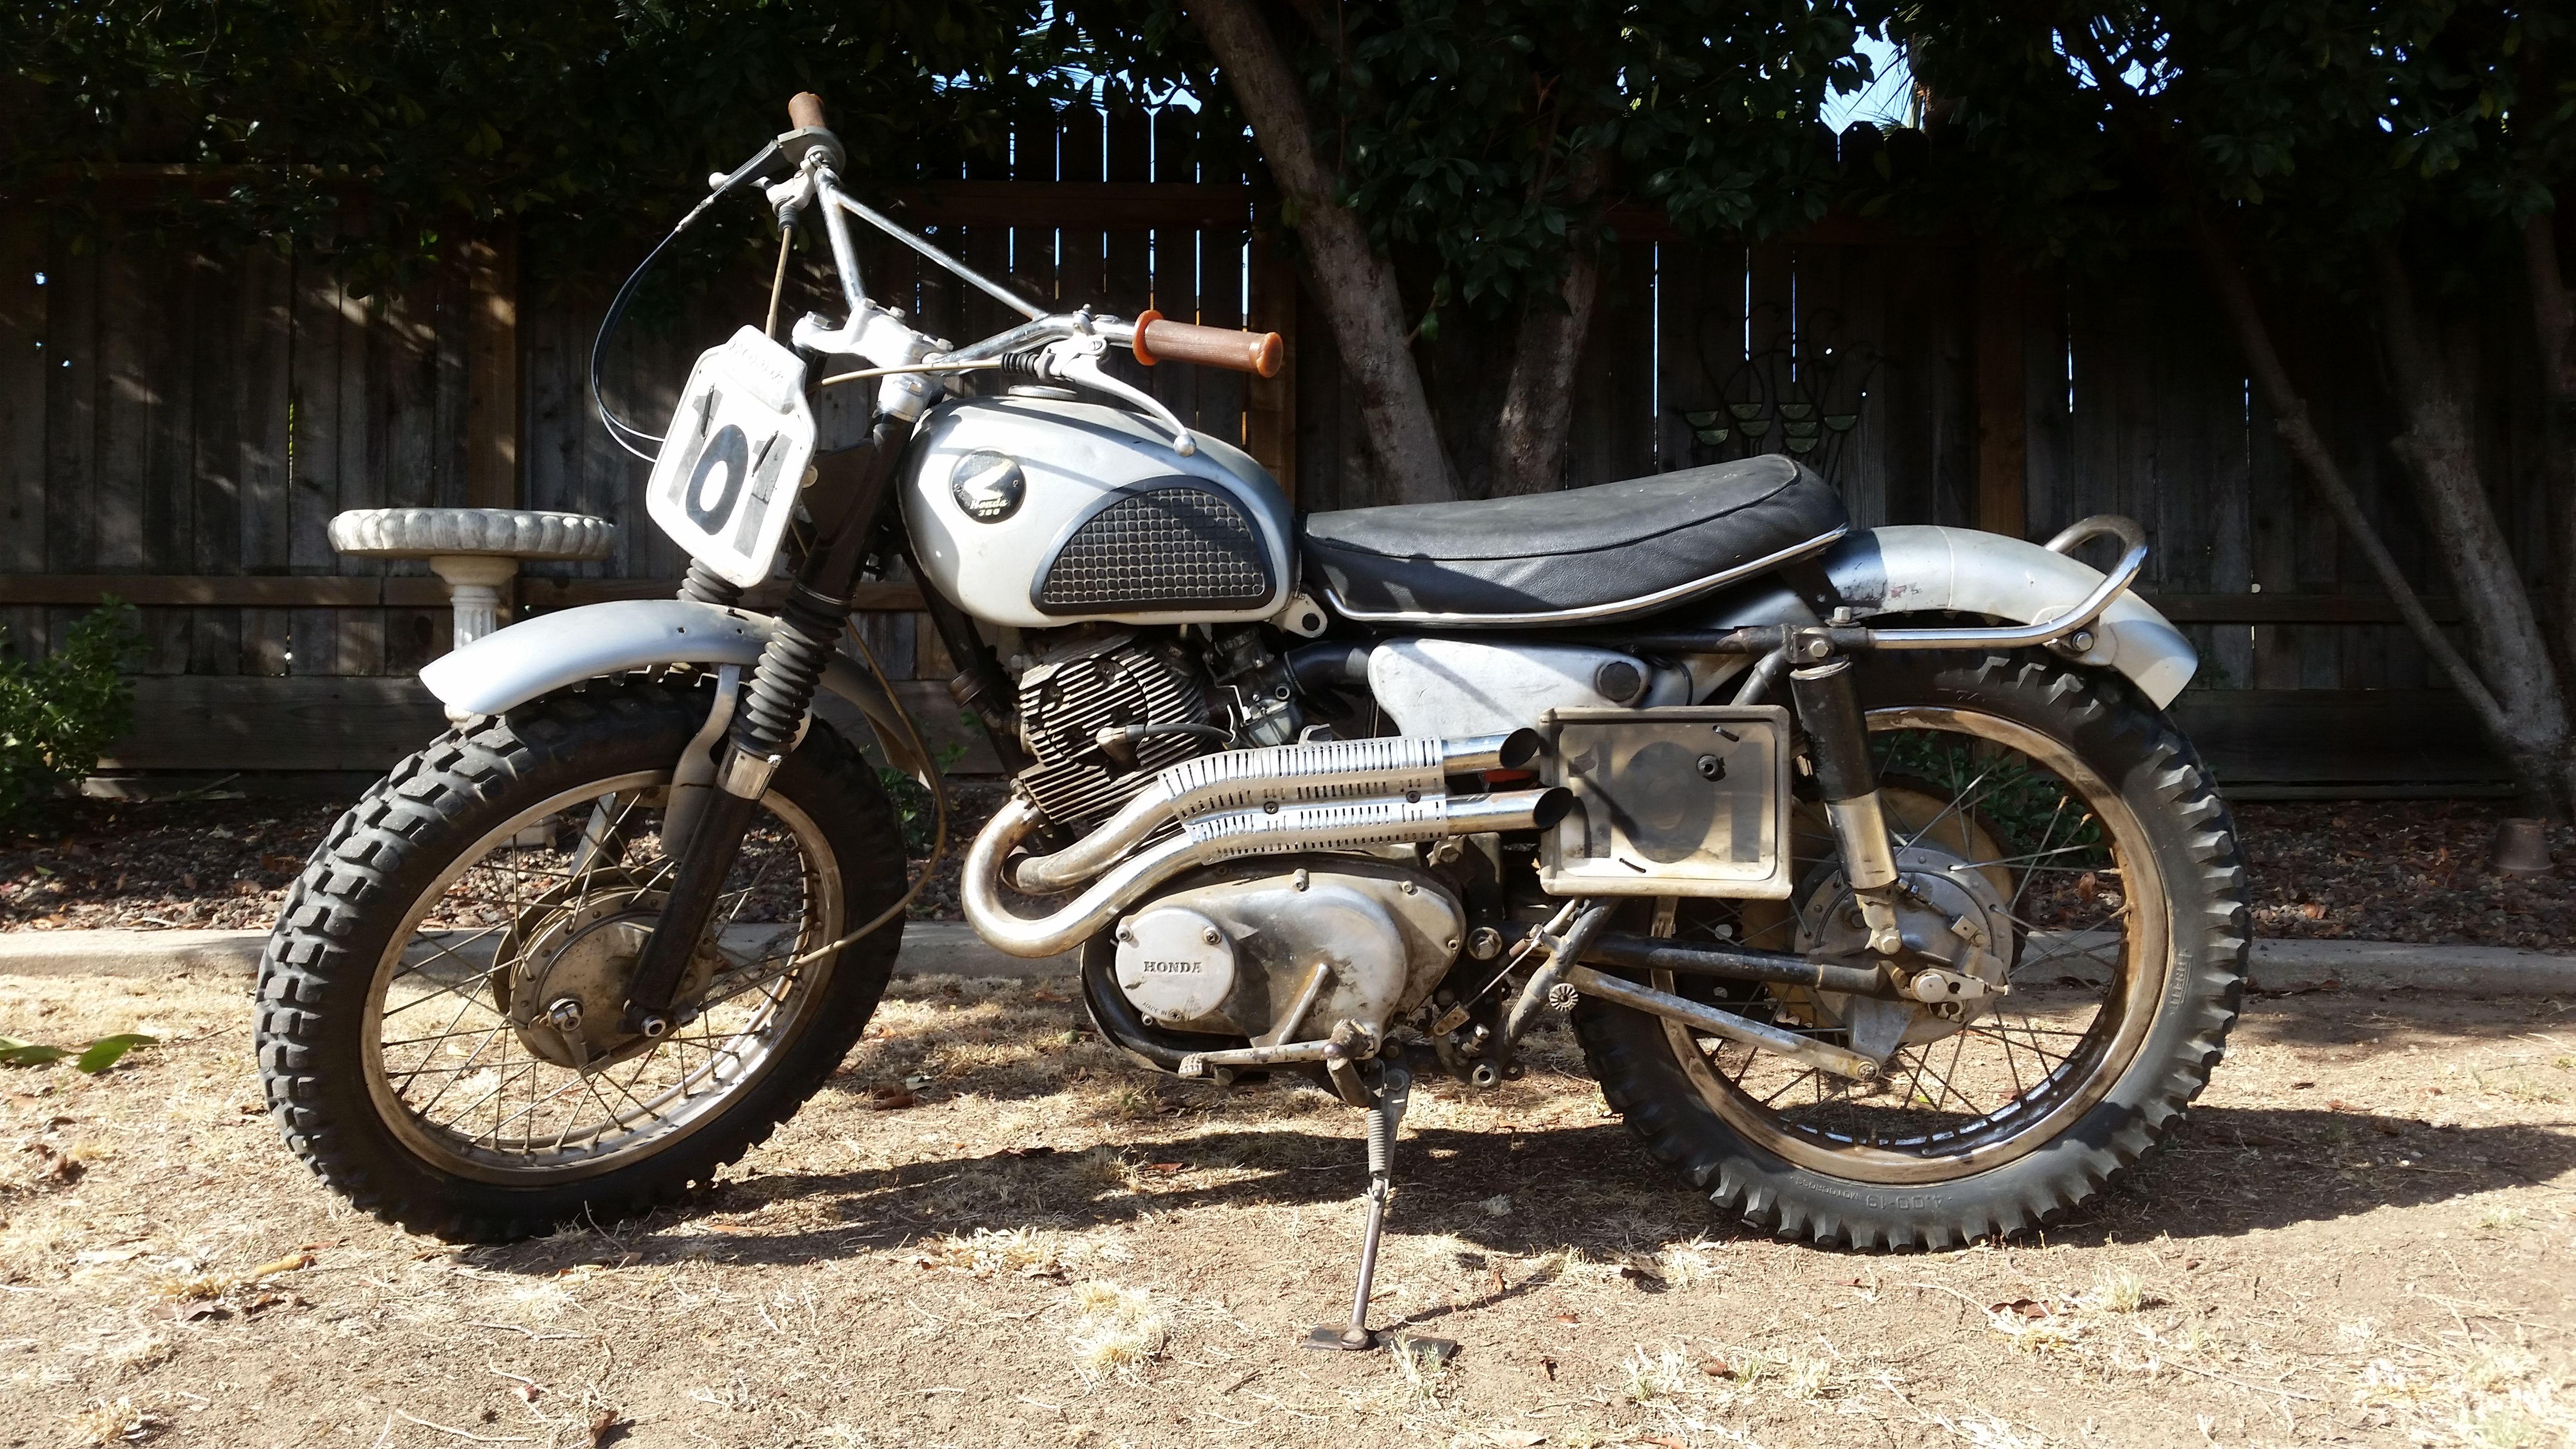 1965 Honda 305 Cl77 Race Scrambler In 2021 Classic Bikes Honda Motocross Bikes [ 2988 x 5312 Pixel ]